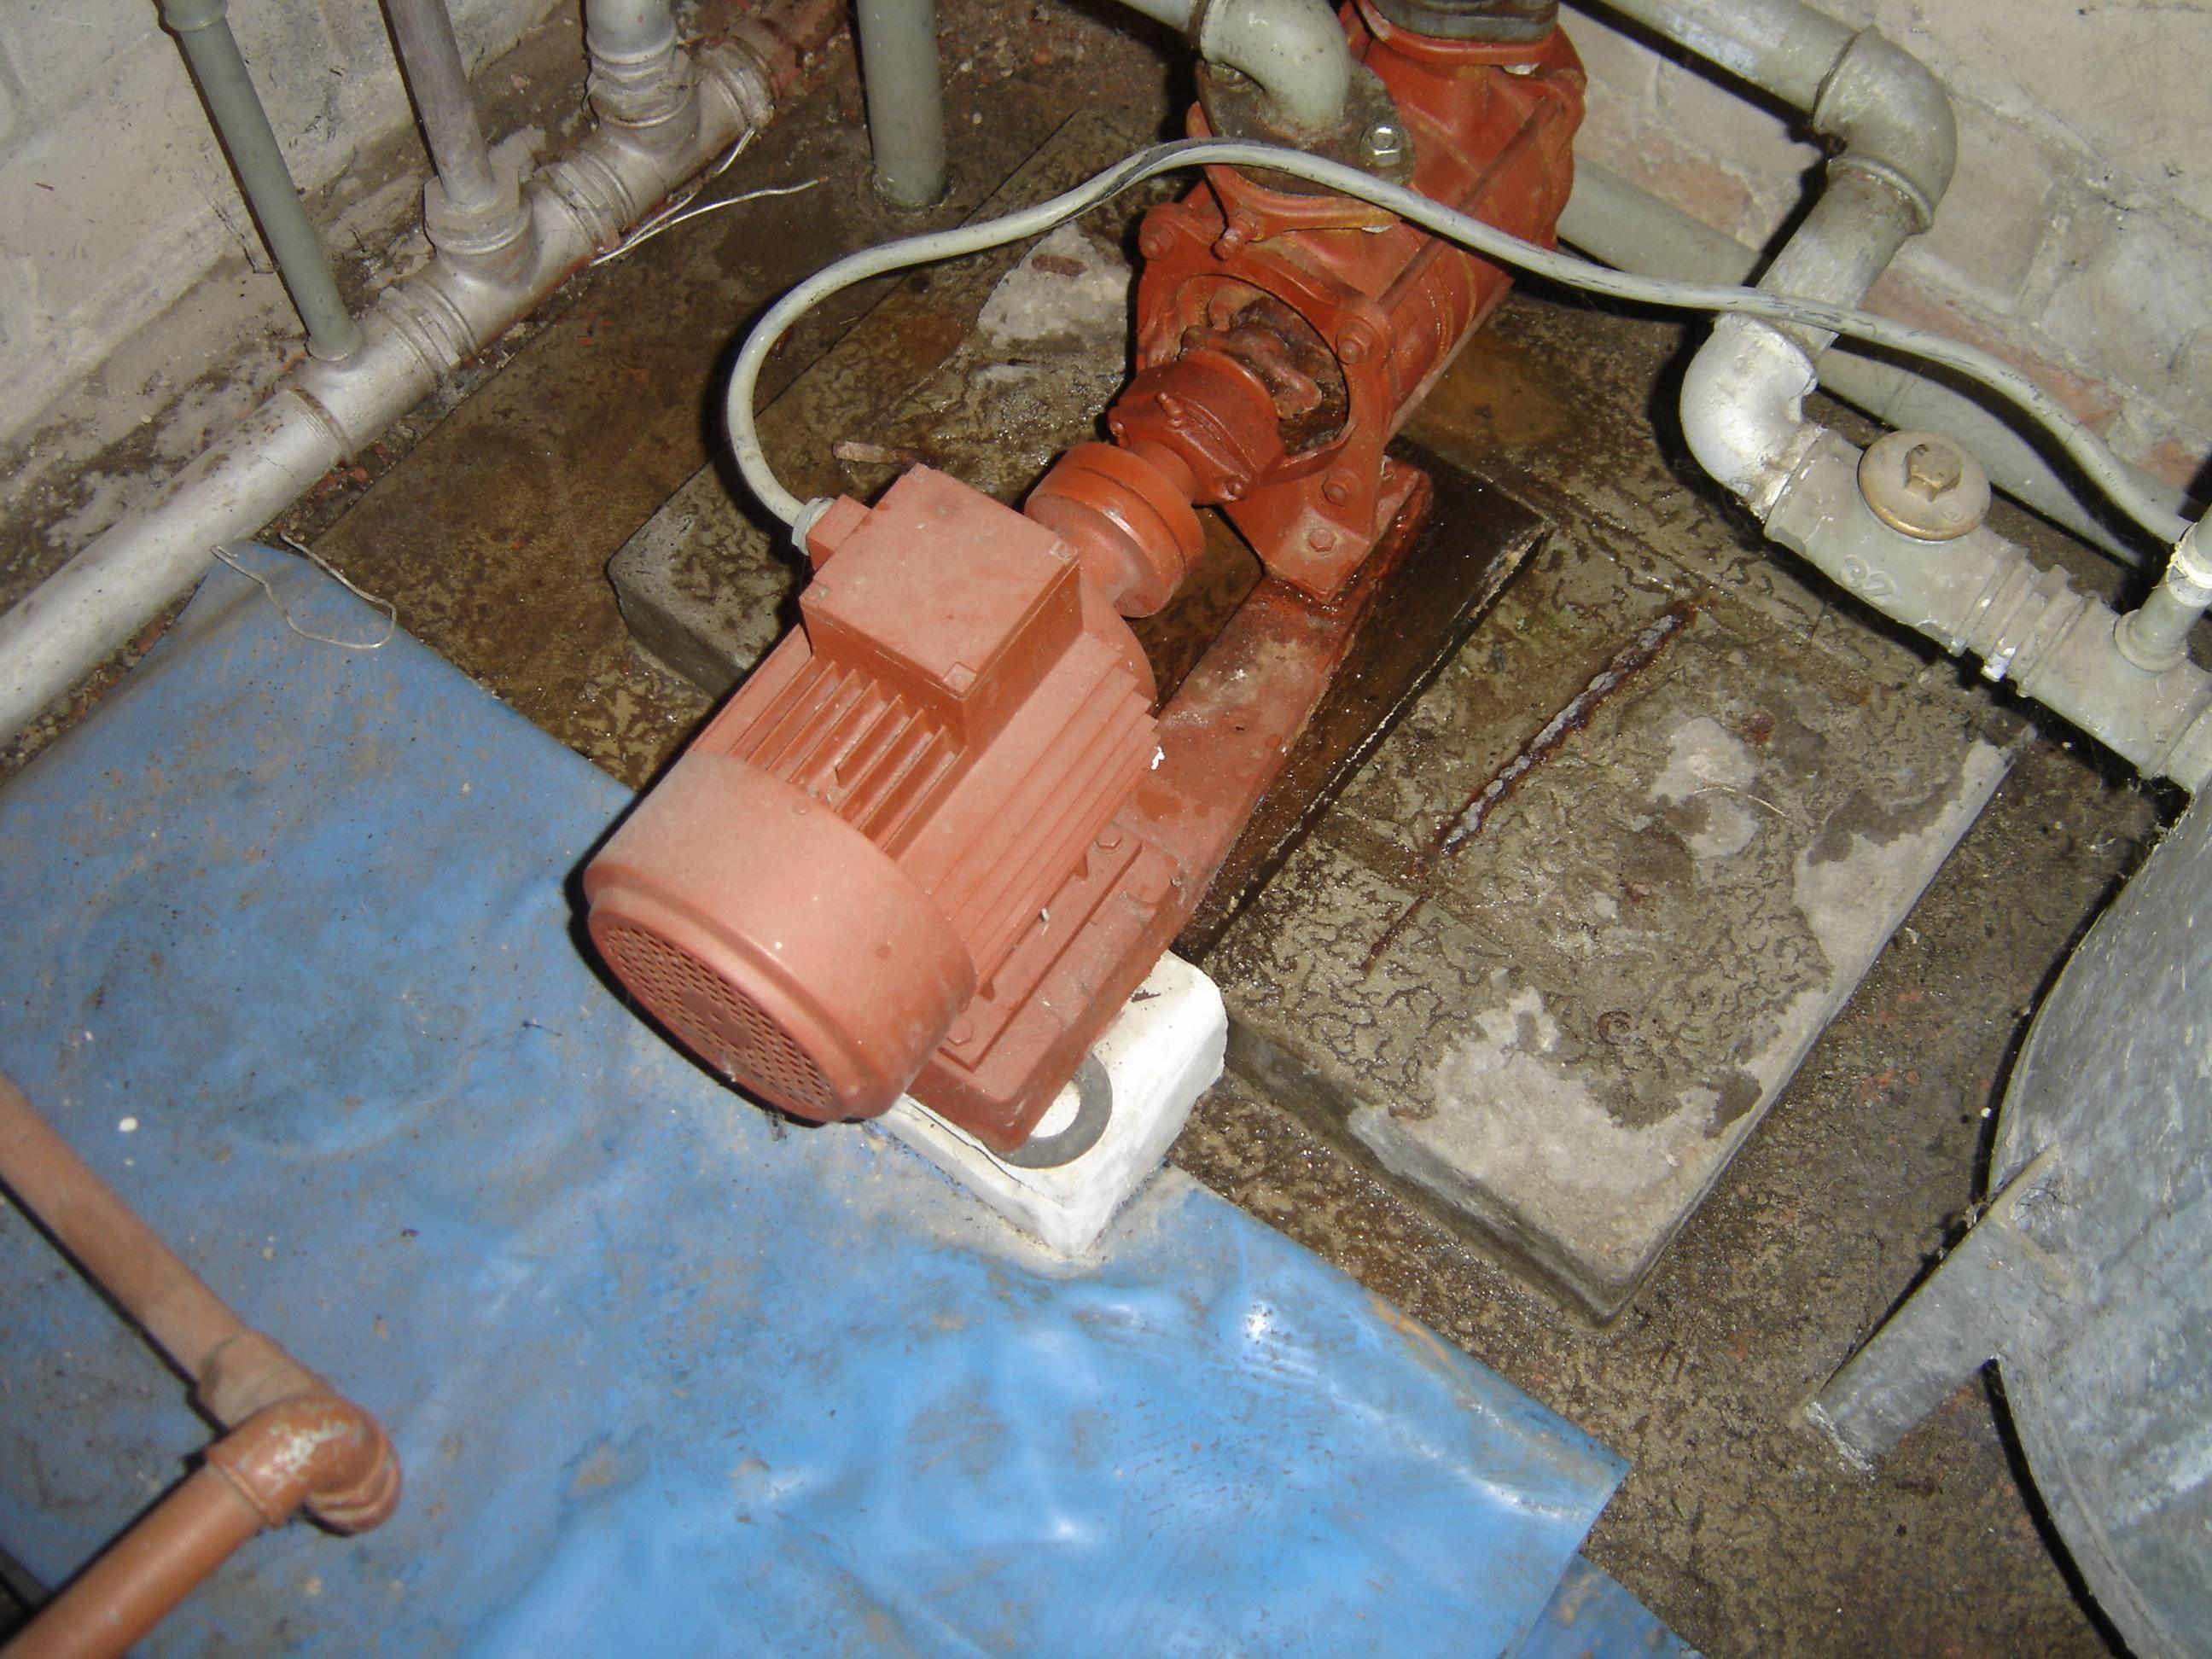 Pompa hydroforowa samozasysaj�ca SKA - przecieka